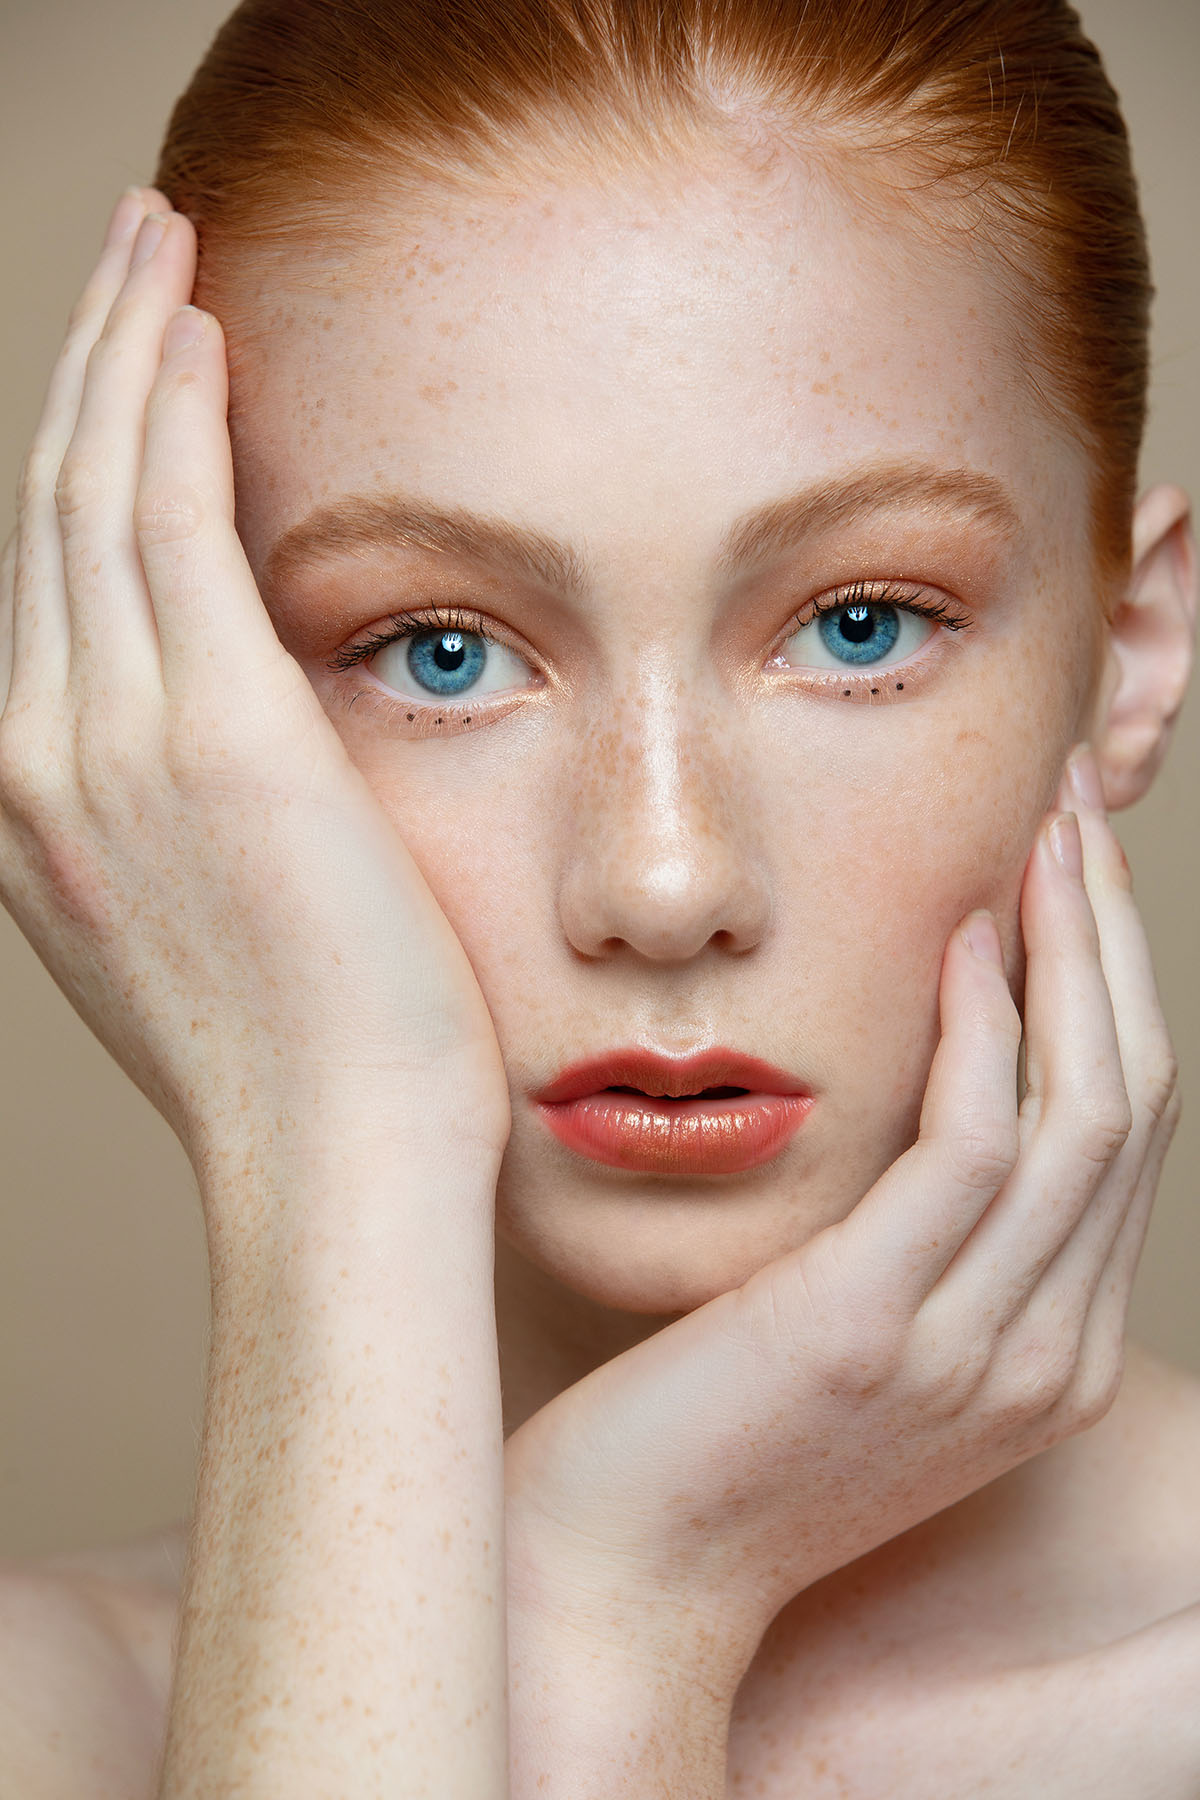 Beauty editorial 'Blue Sapphire Eyes' by Loesje Kessels Fashion Photographer Dubai